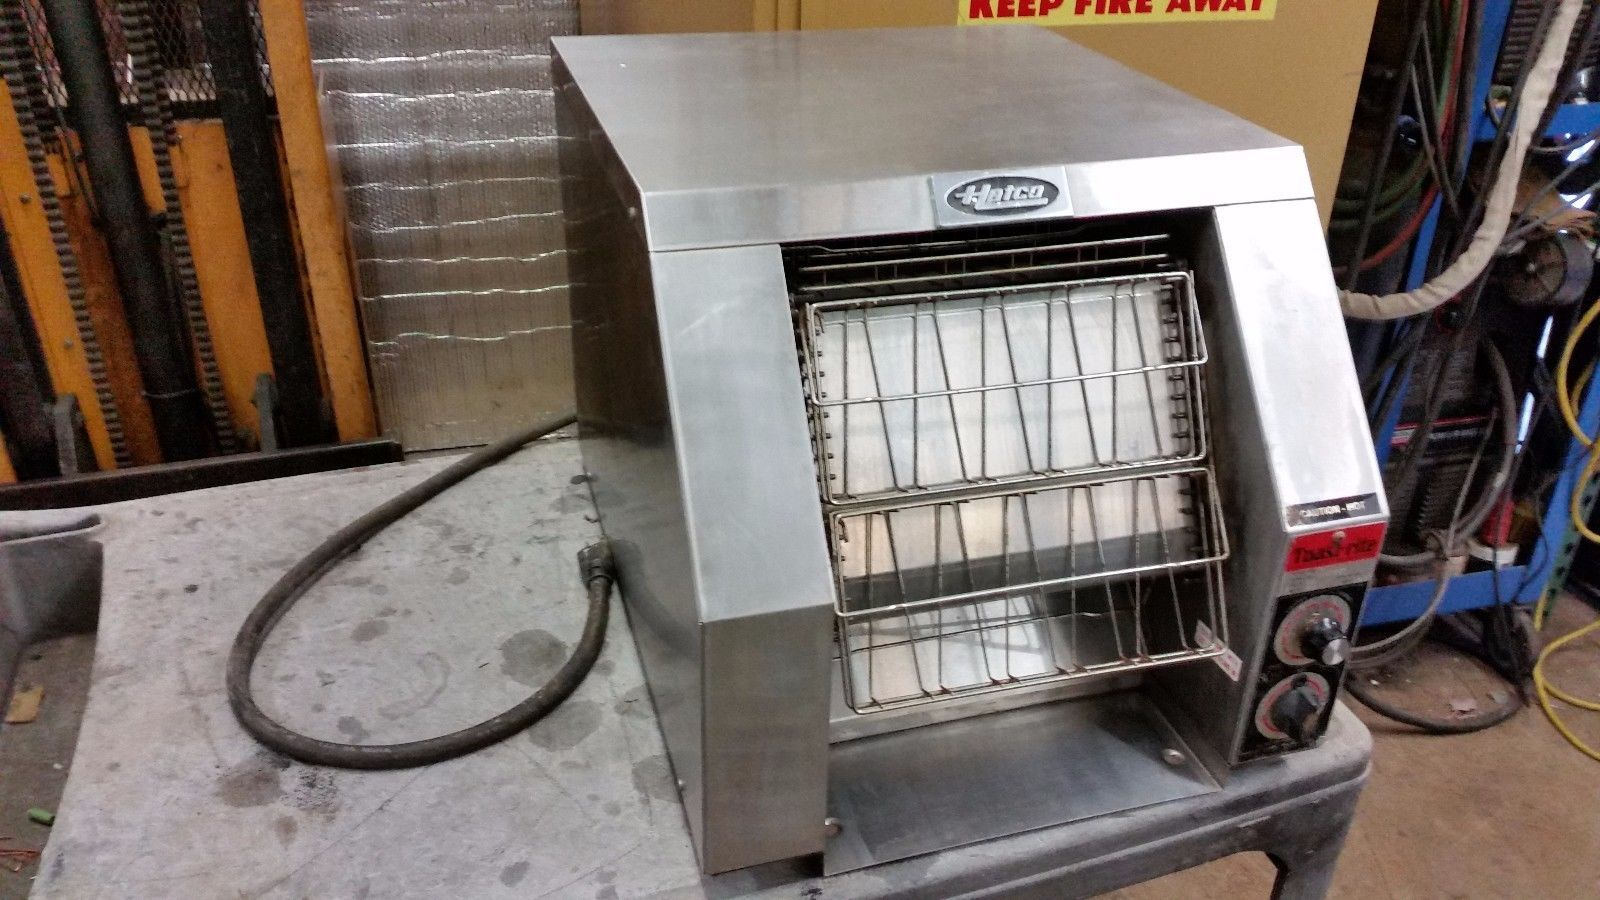 Hatco Toast-Rite SLICED BREAD Conveyor Toaster 120V